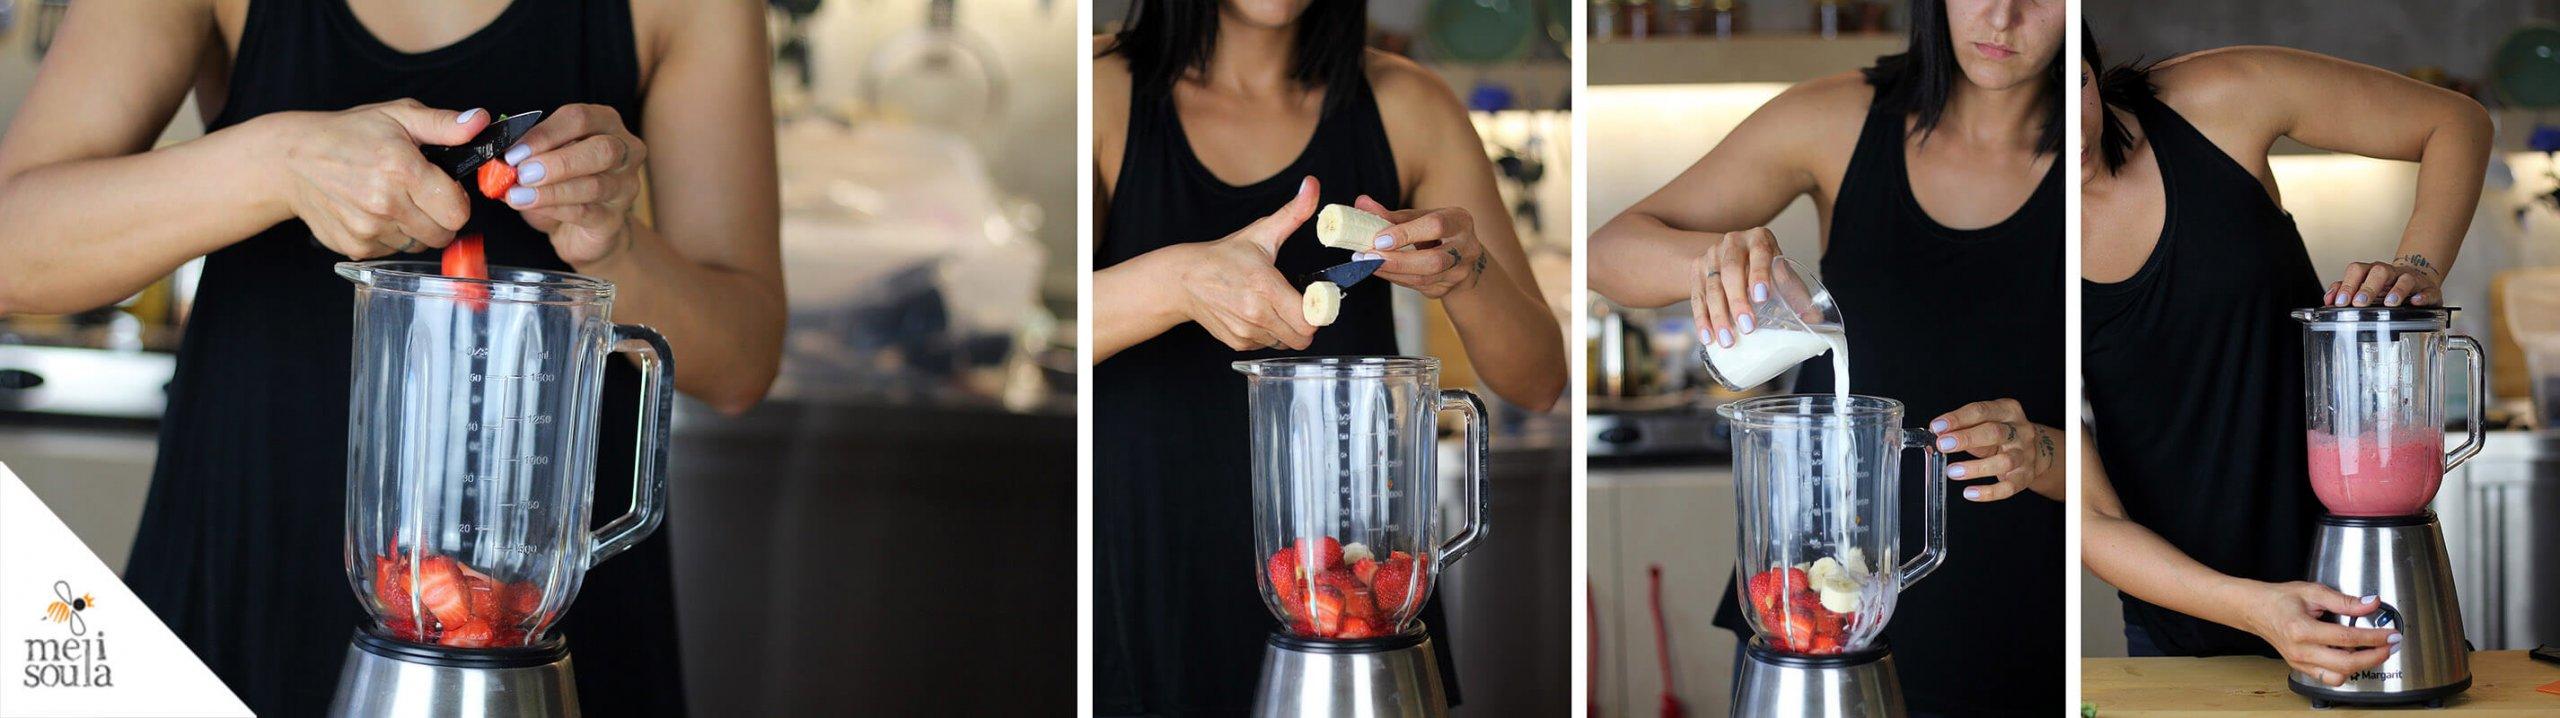 Strawberry_smoothie